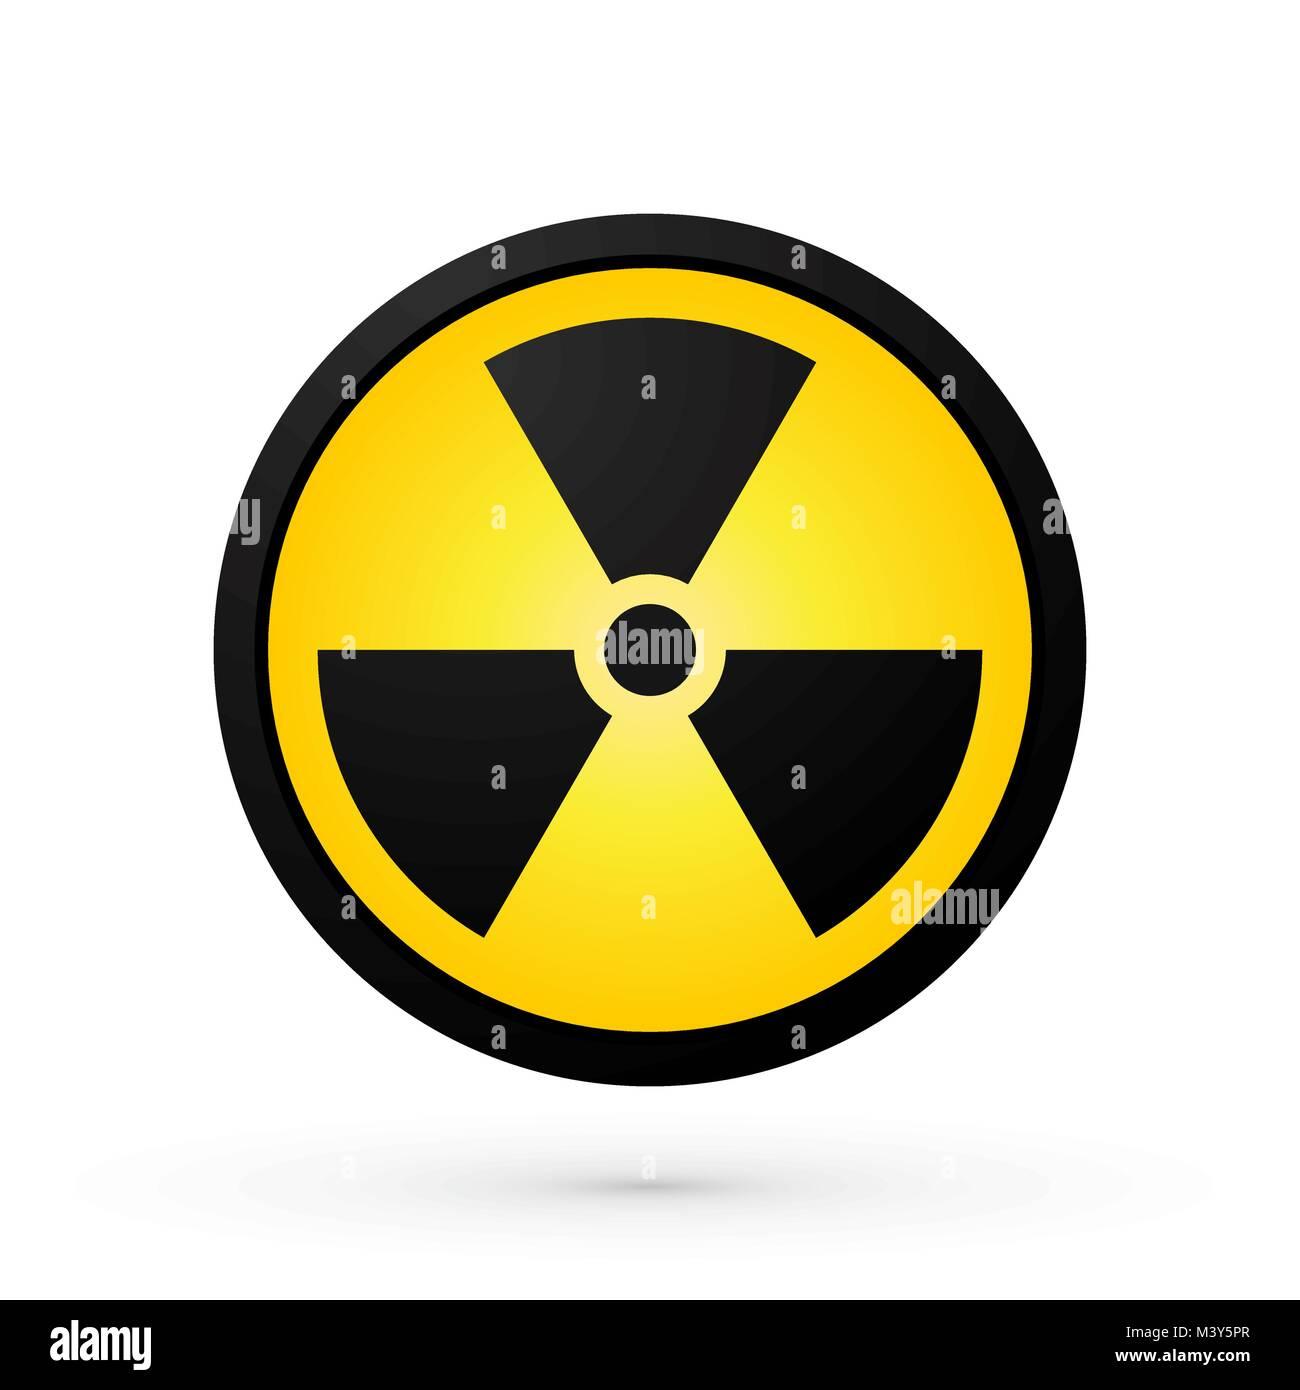 simple radioactivity symbol - Stock Image